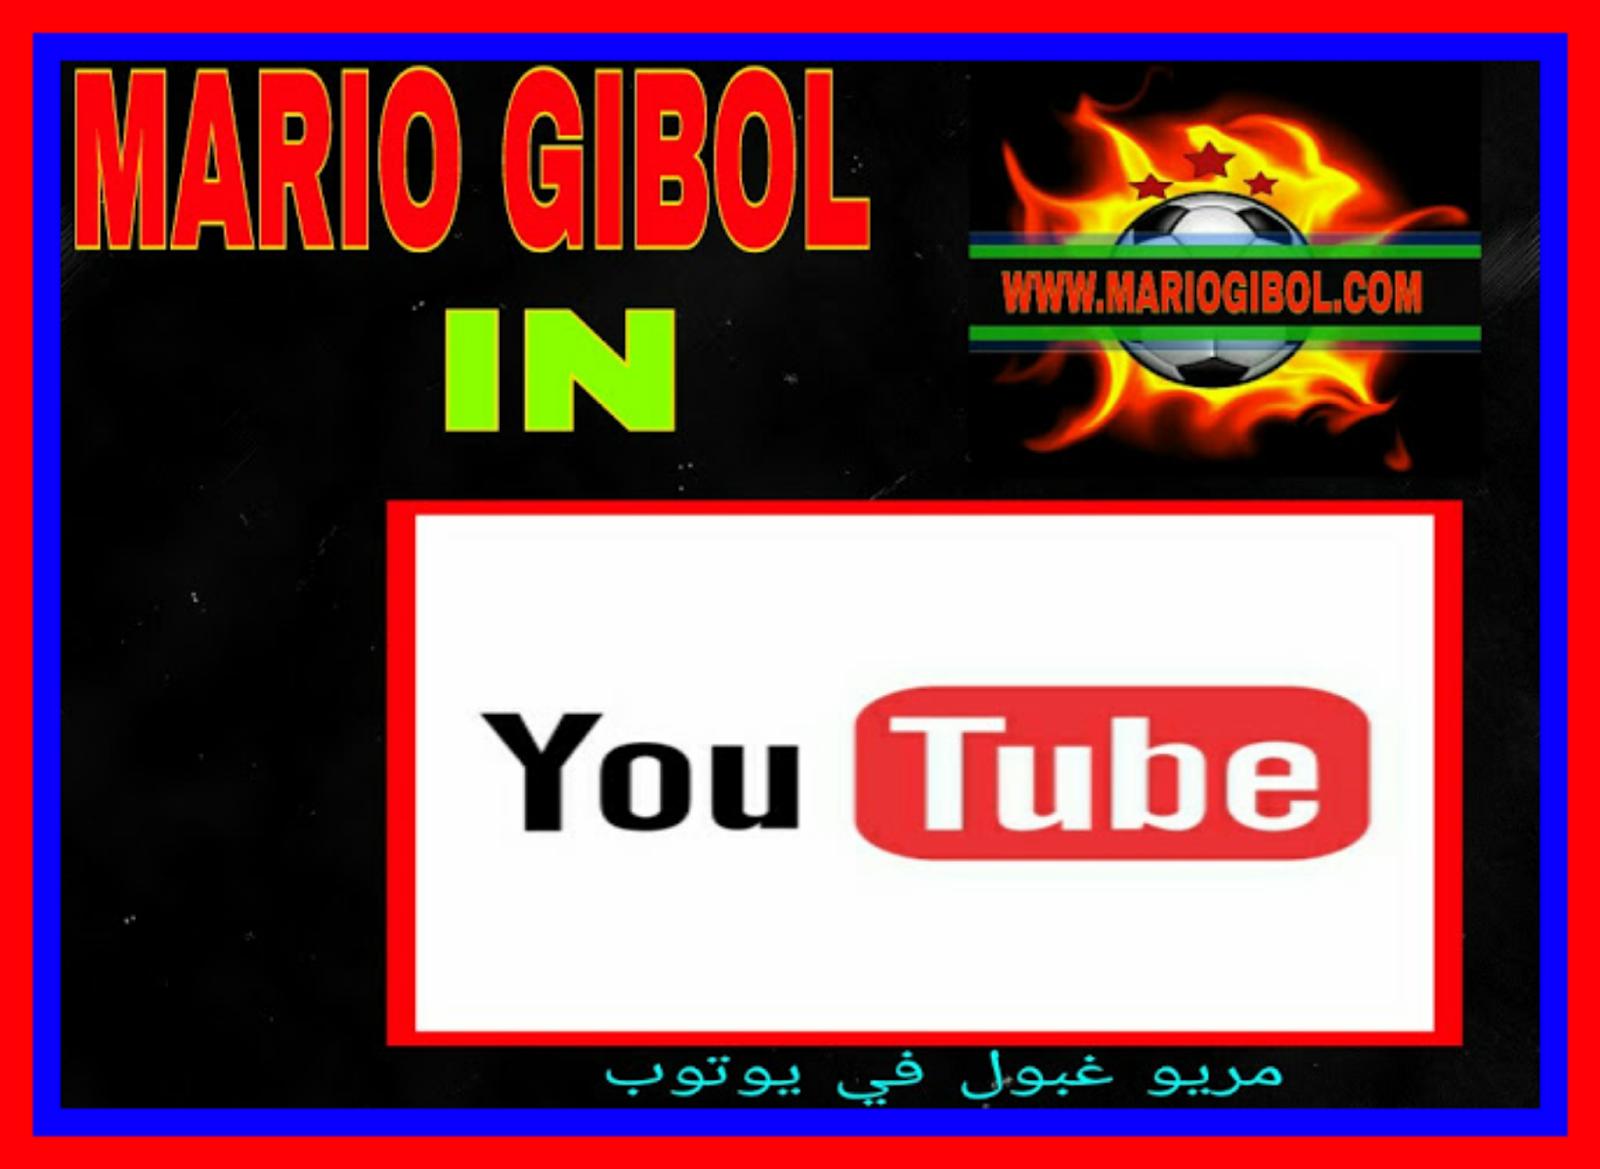 7dc527cdd8ae8 mario gibol in youtube   مريو غبول في يوتوب